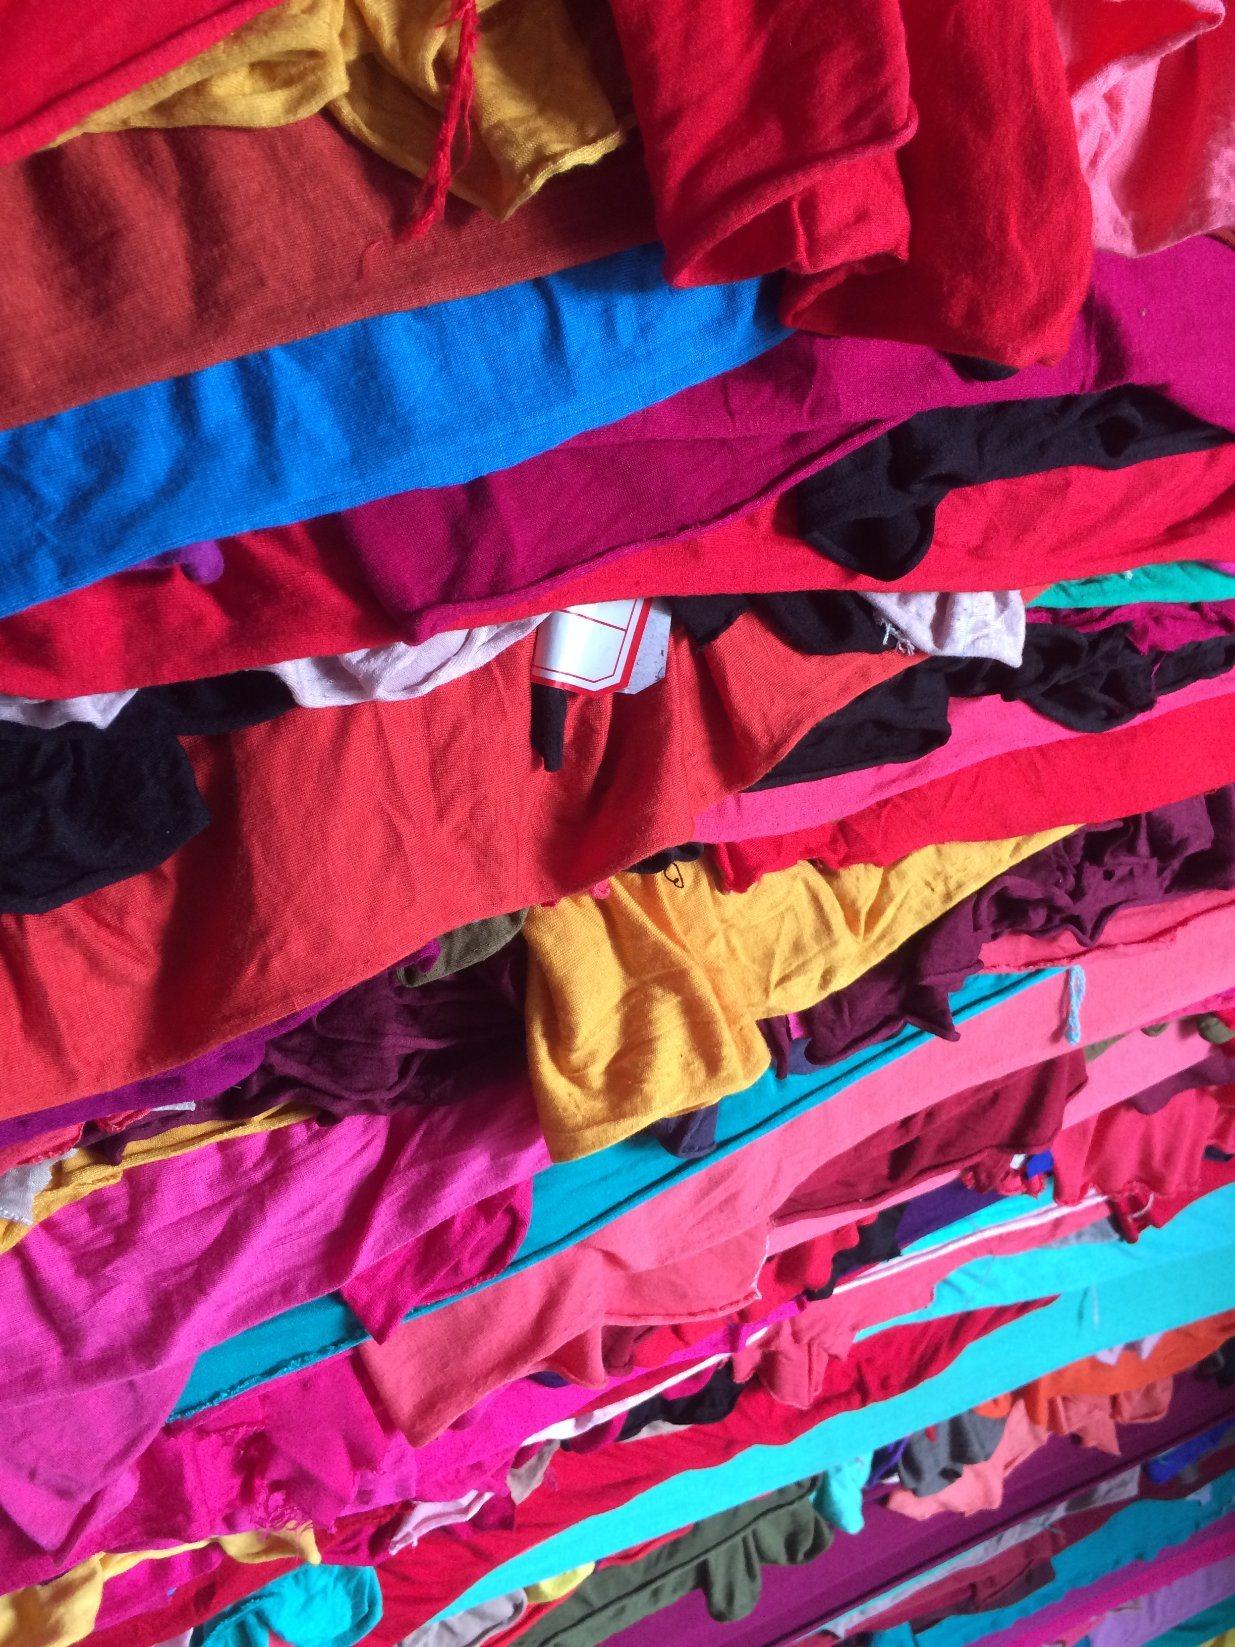 Polo Plain Dyed Fabrics Stocks